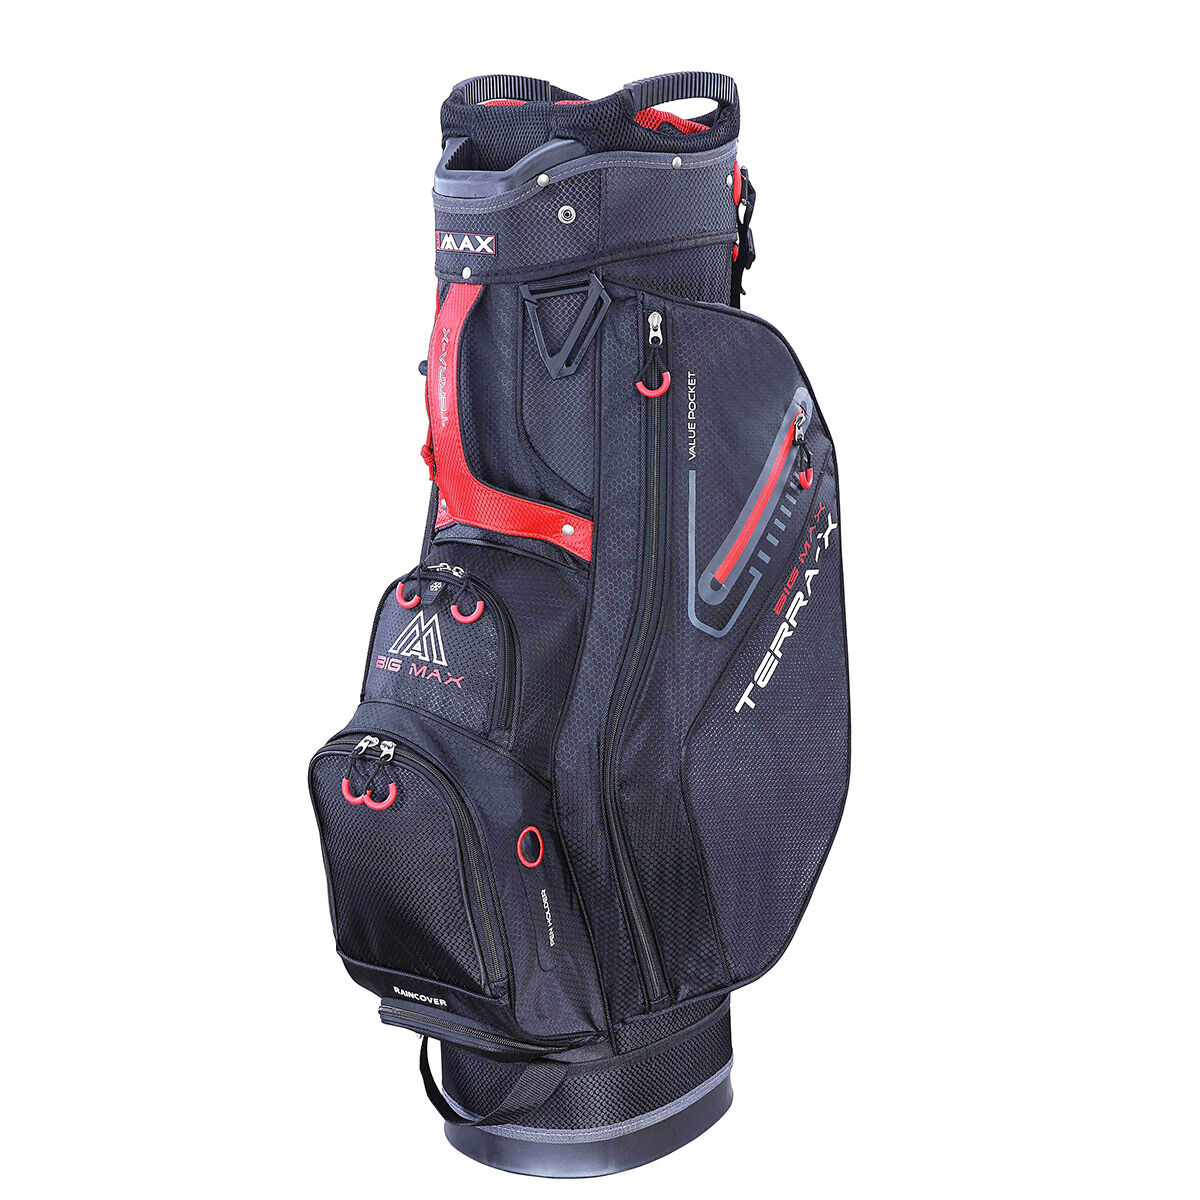 Sac chariot BIG MAX Terra X, homme, Rouge noir    Online Golf